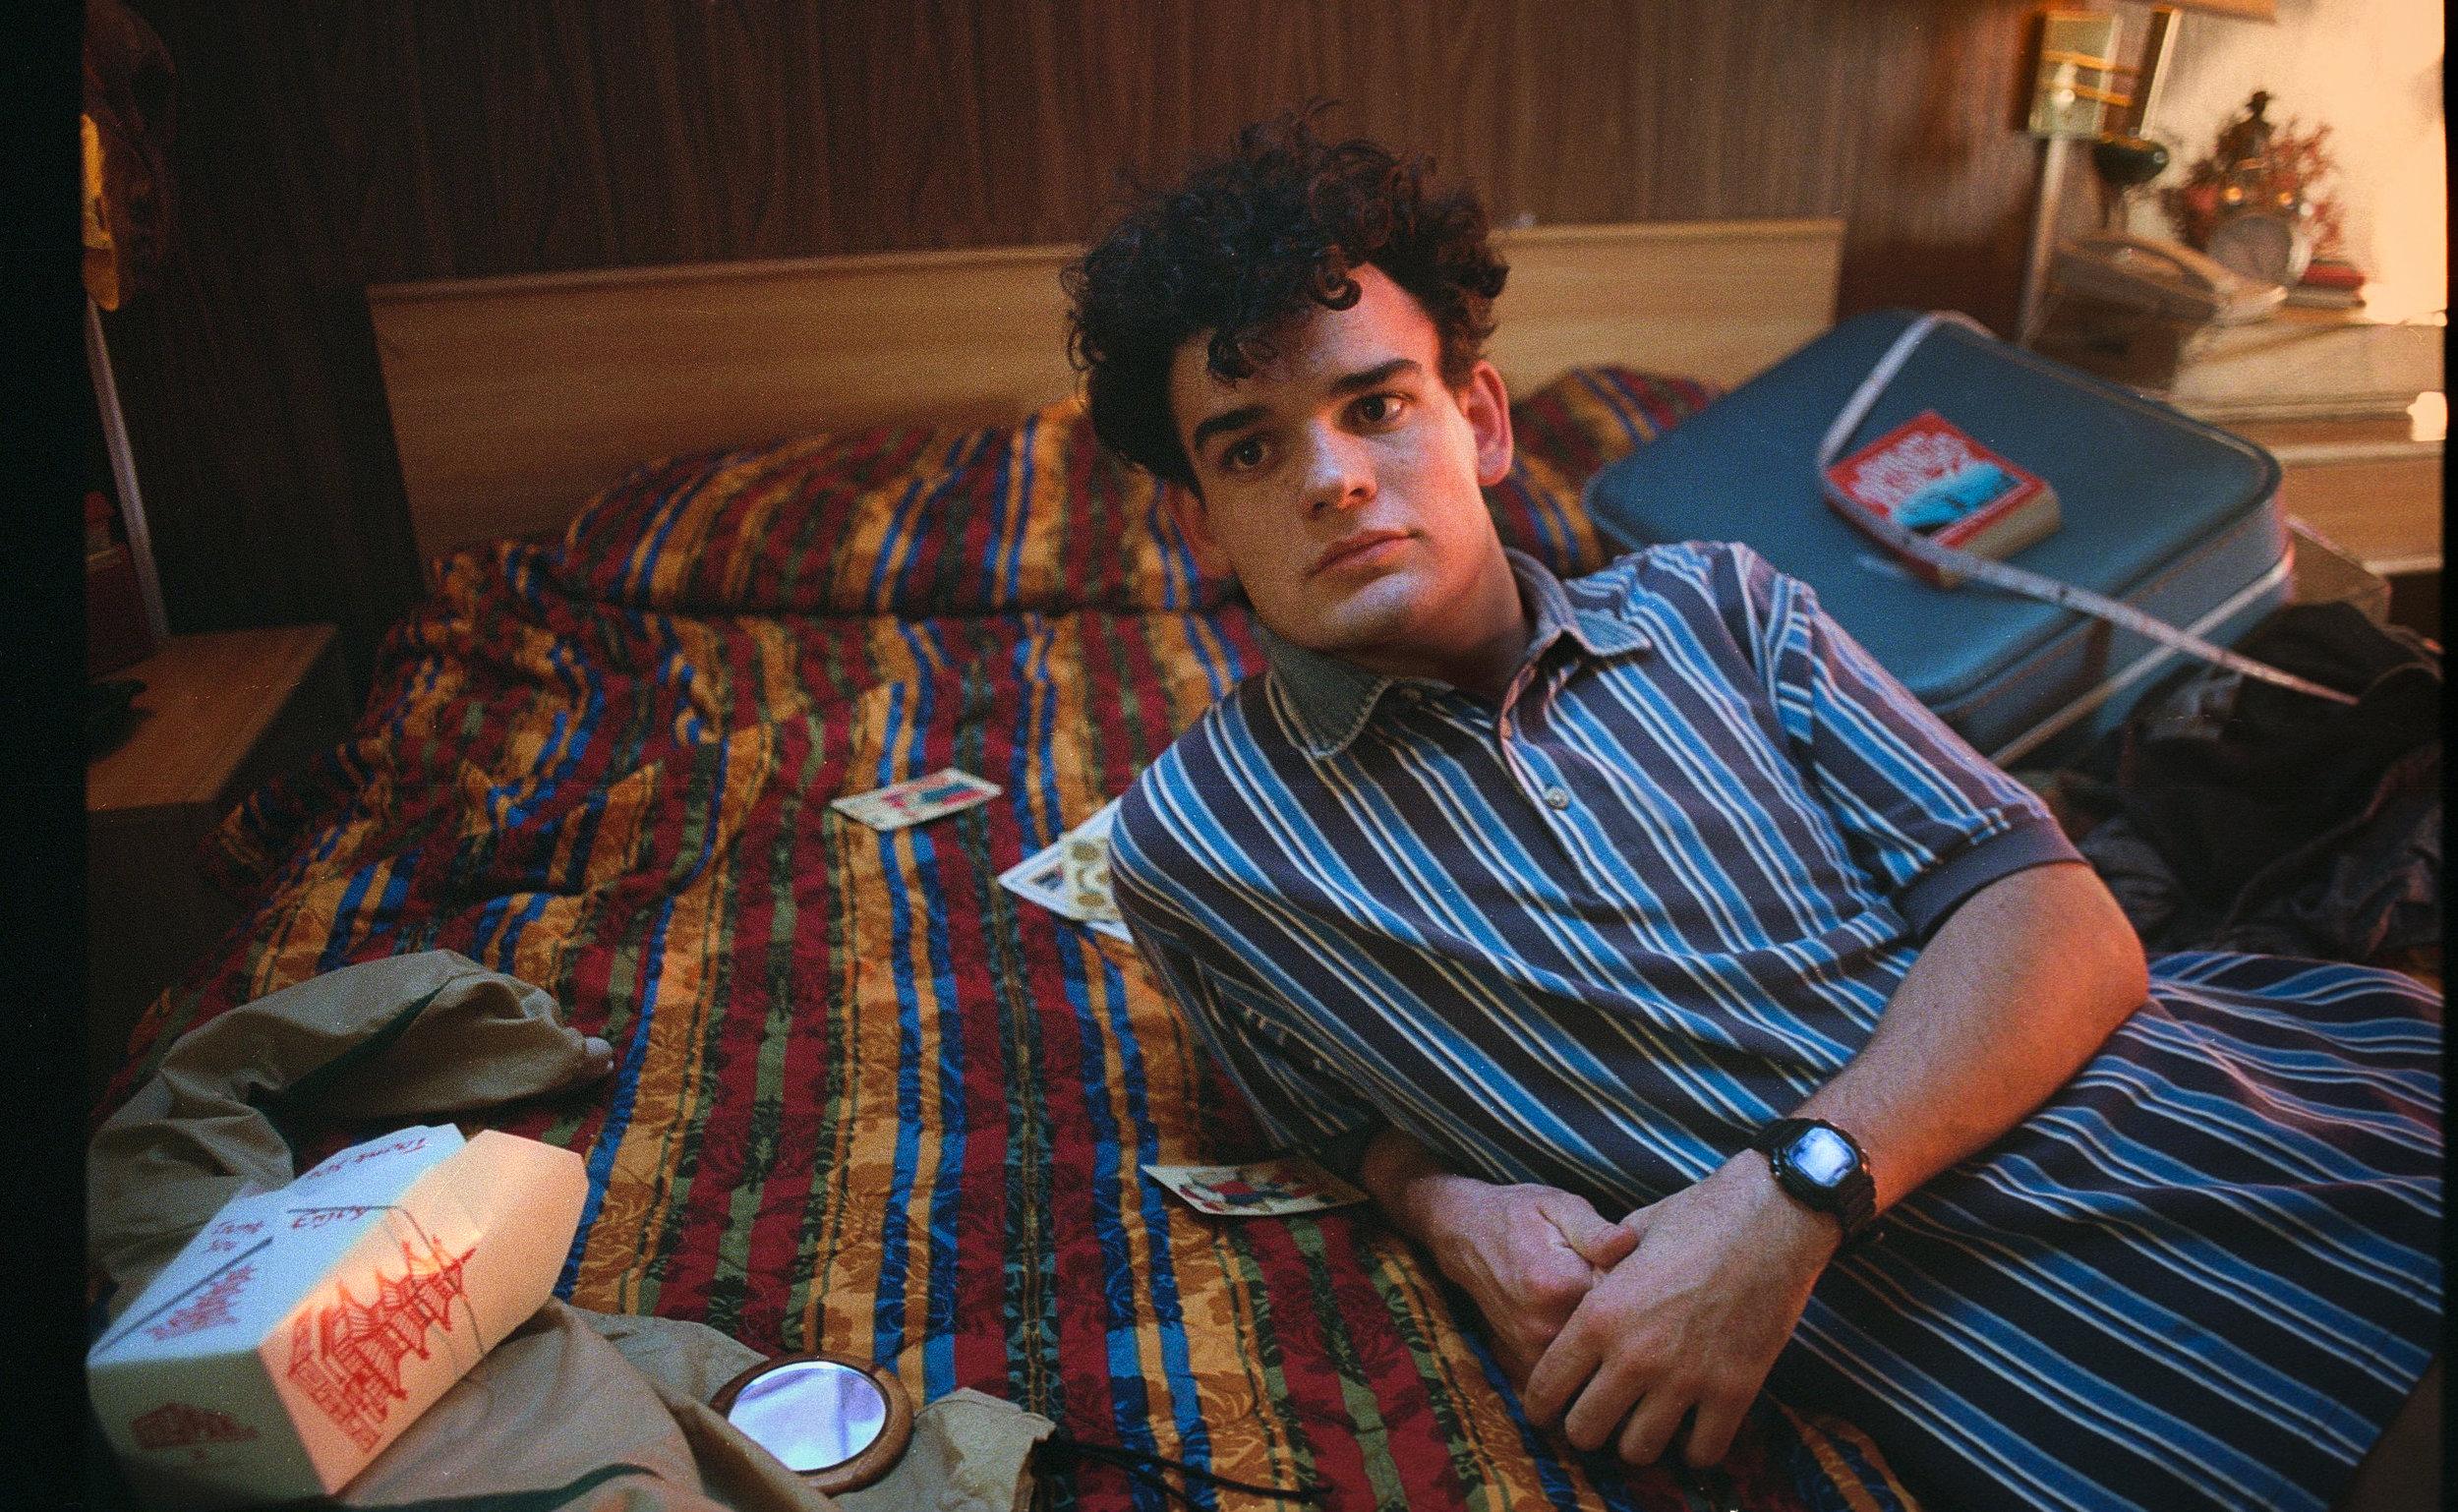 Dylan chillin on bed.jpg